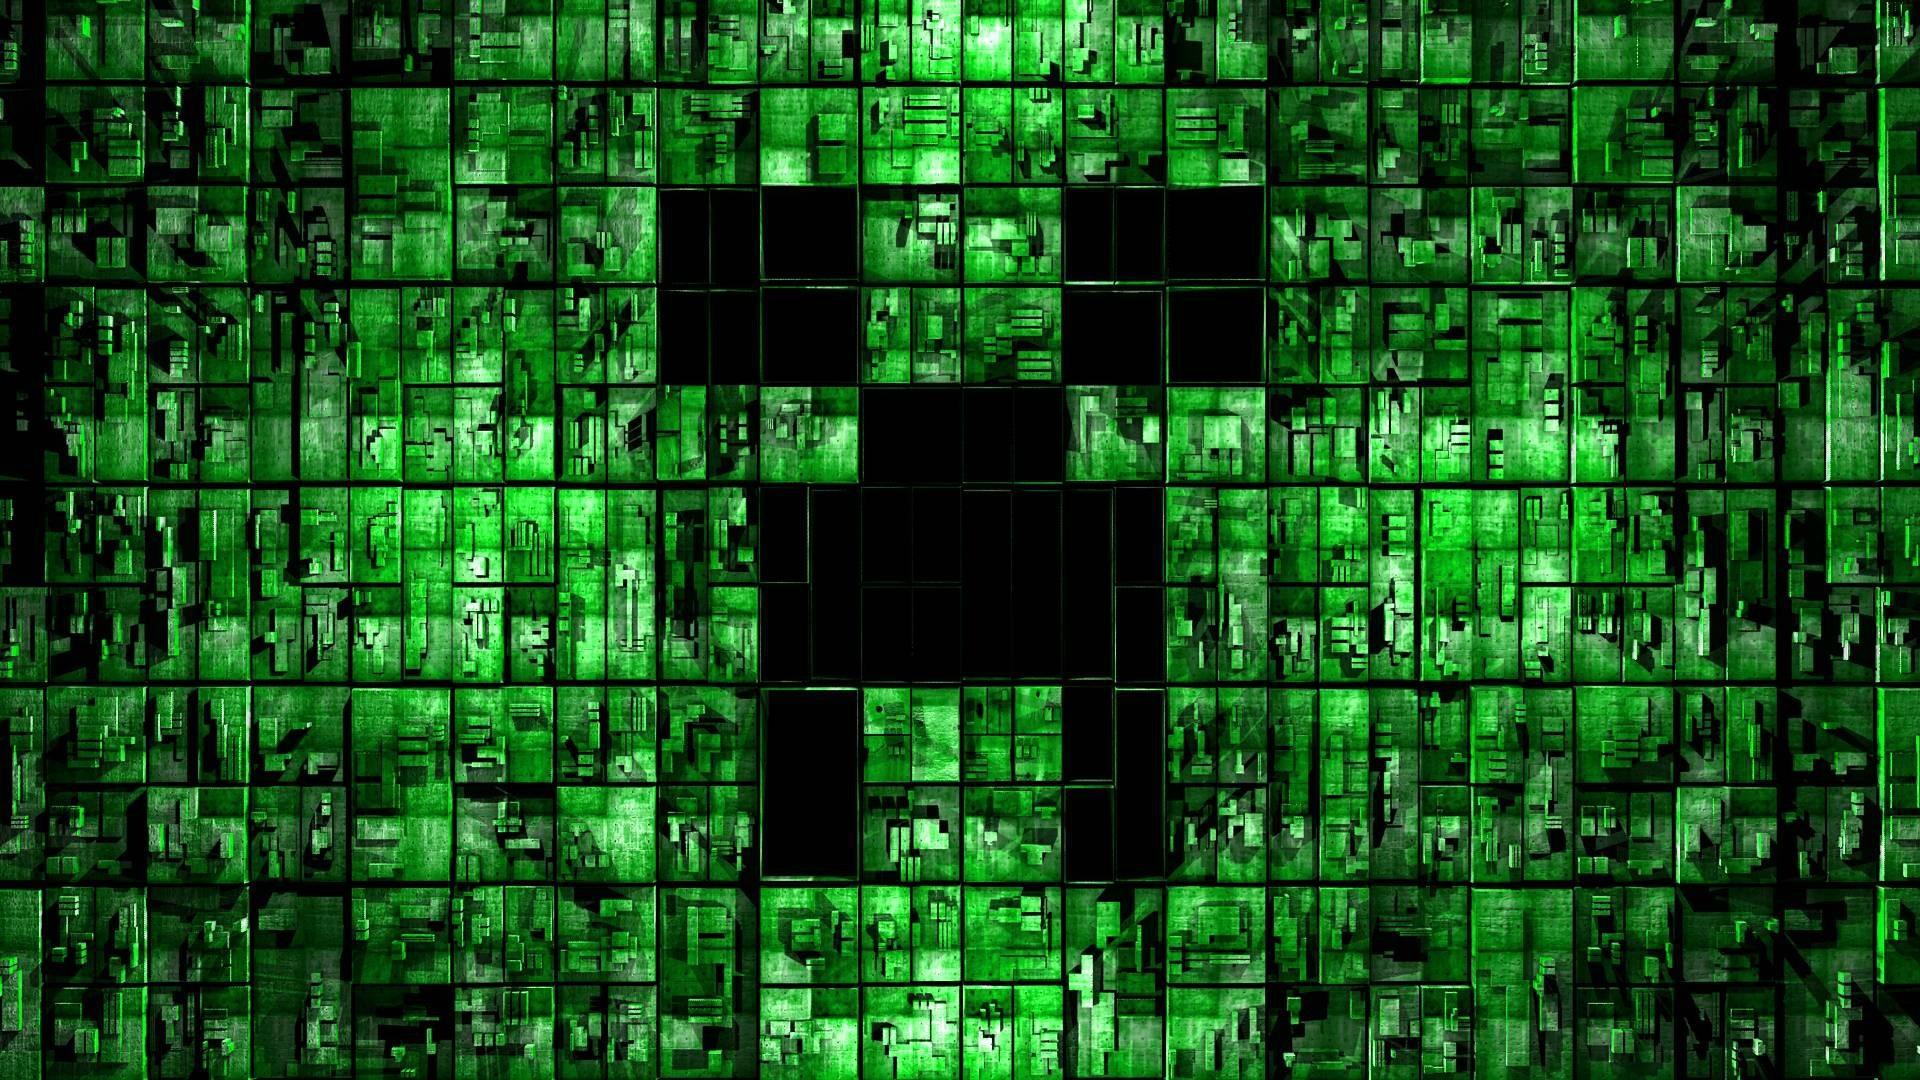 Call Of Duty Infinite Warfare Wallpaper Designs Desktop Green Cool Pixel.  mirrored subway tile. …